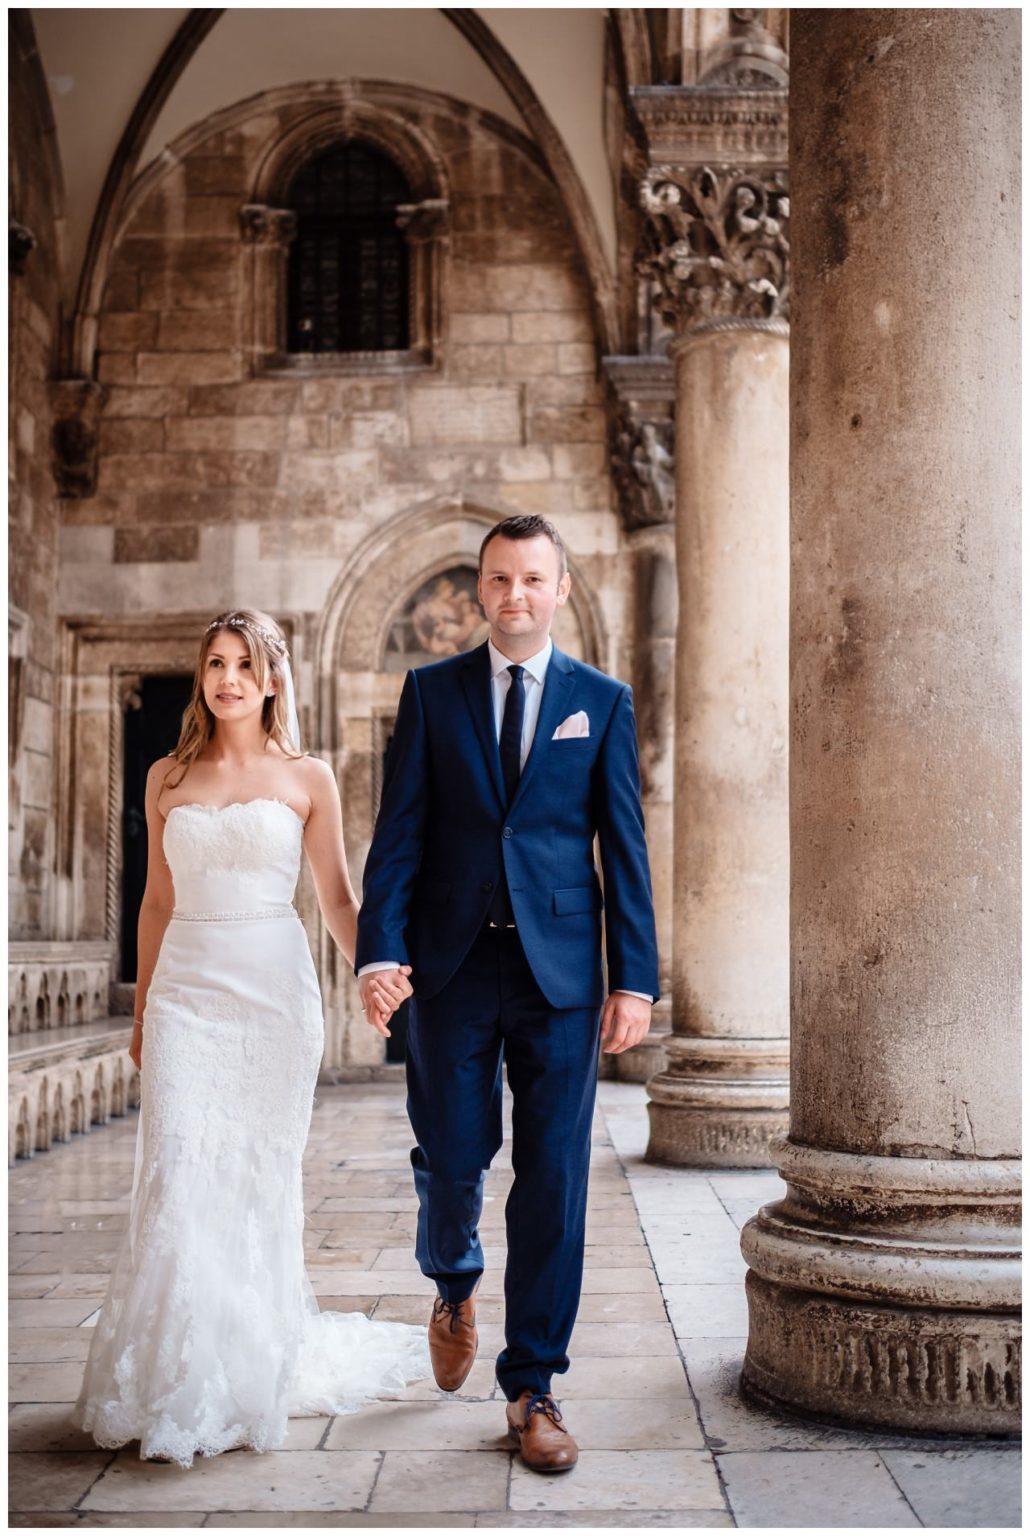 after wedding shooting kroatien hochzeitsfotos 23 - After Wedding Shooting in Kroatien